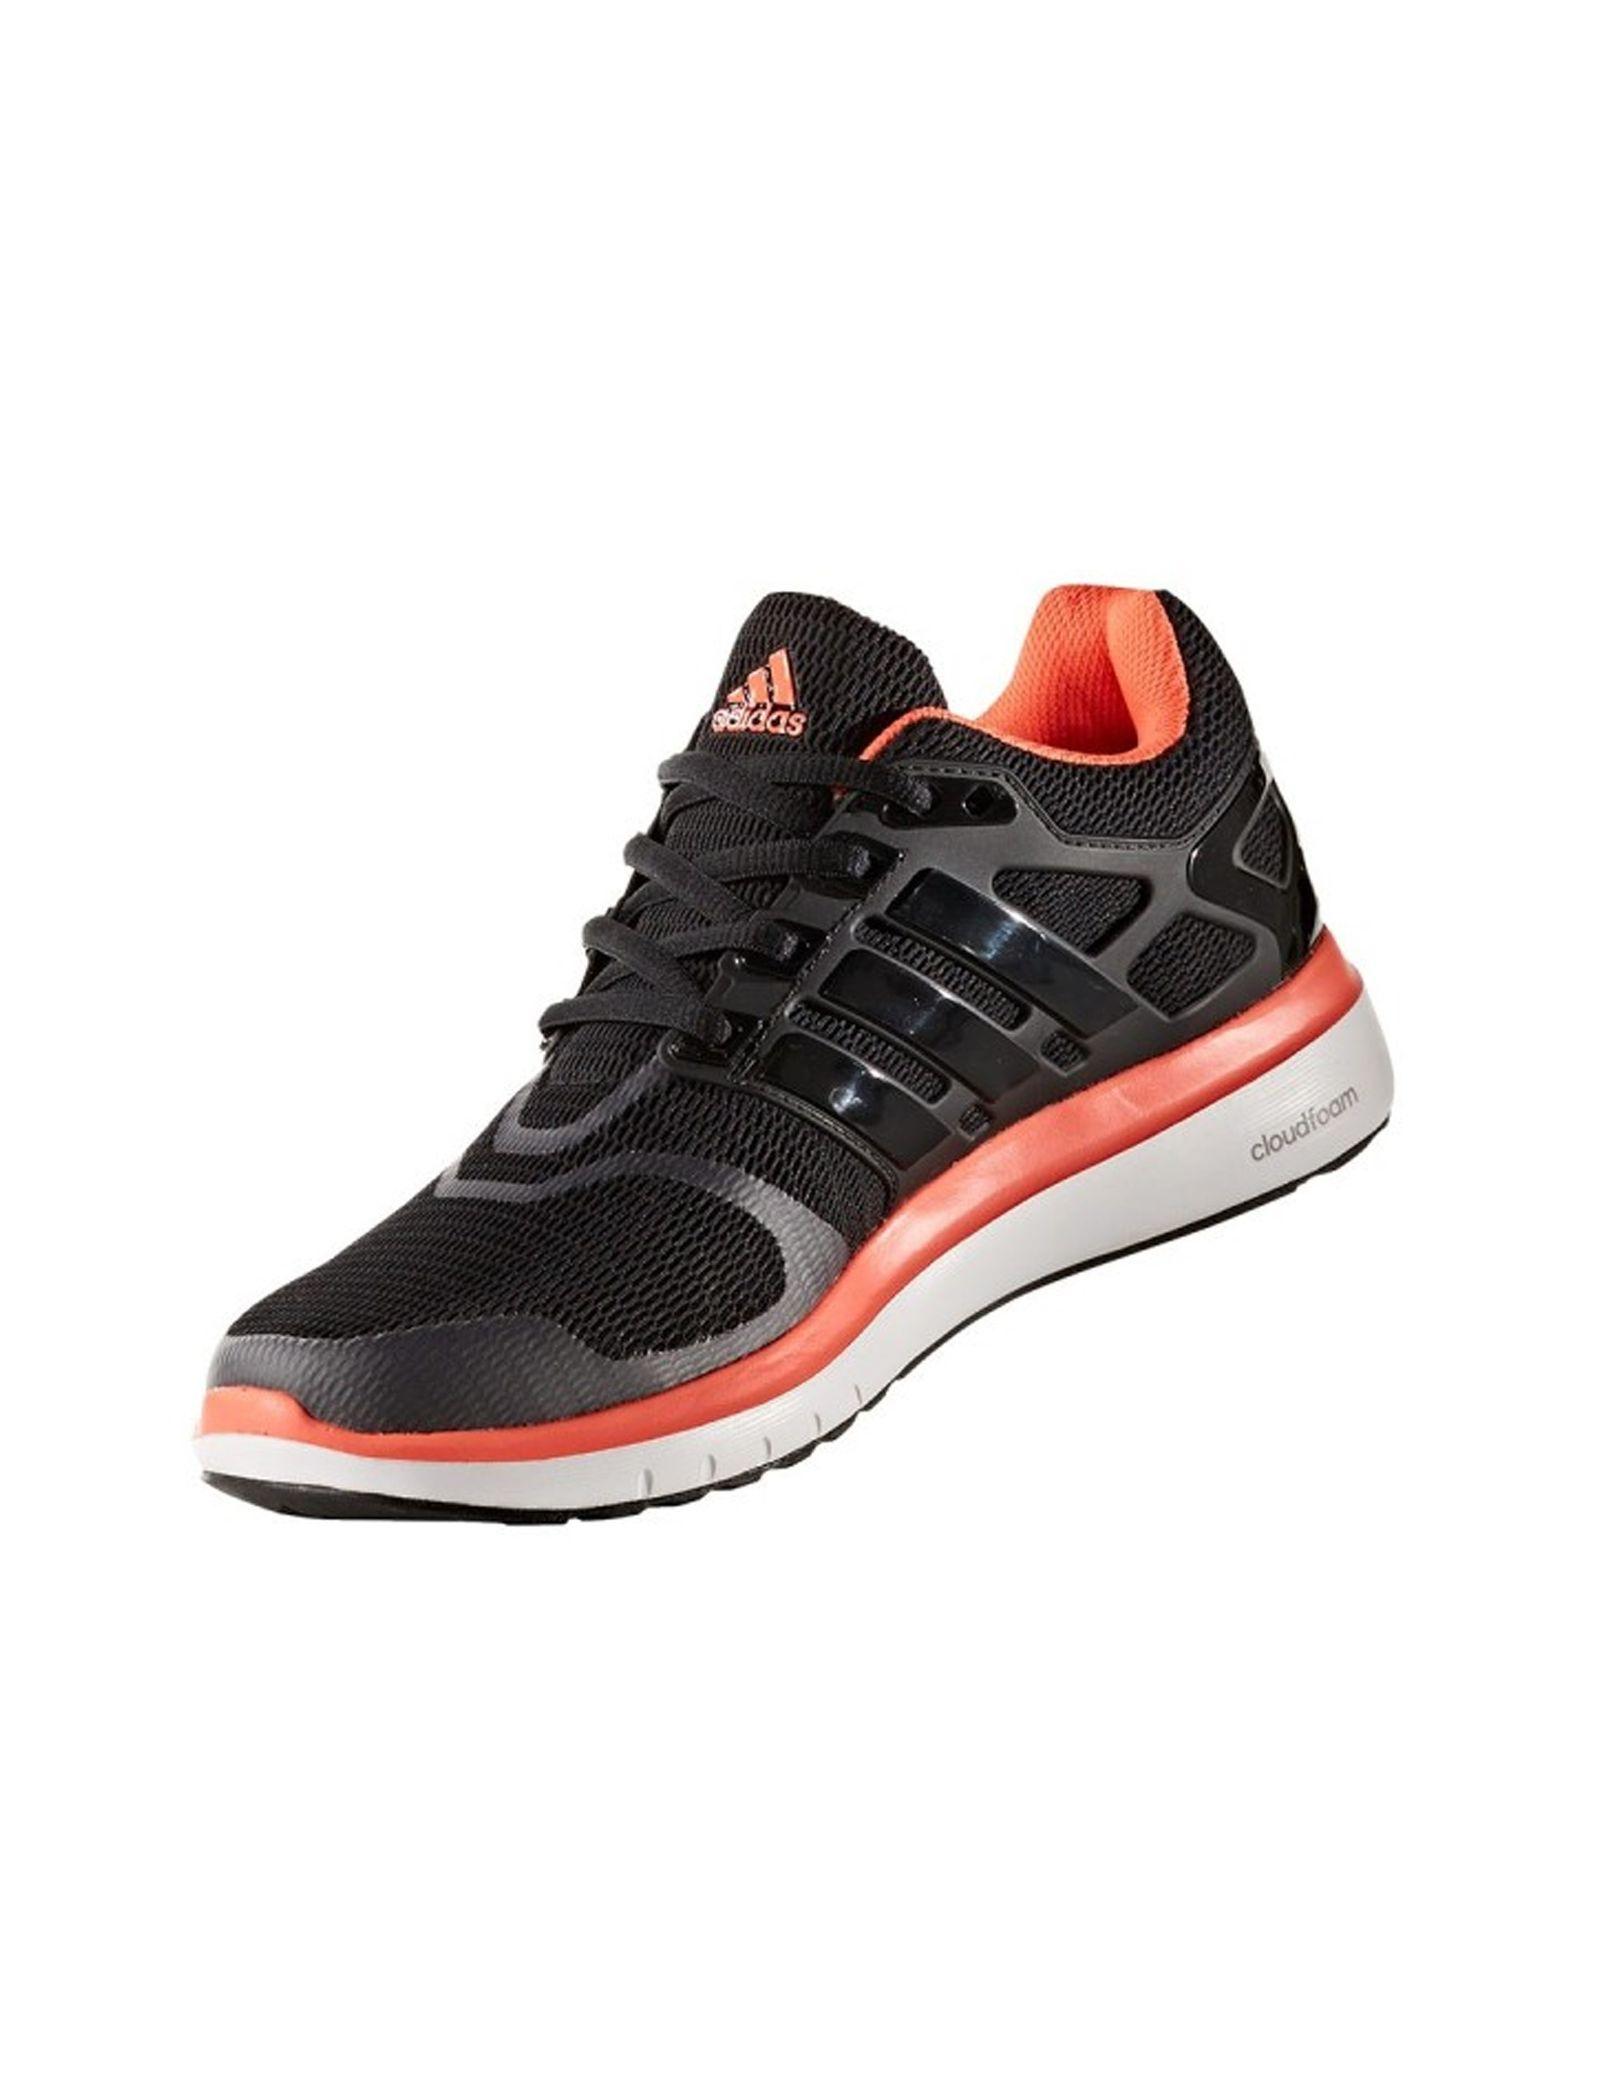 کفش دویدن بندی زنانه Energy Cloud V - آدیداس - مشکي و نارنجي - 4